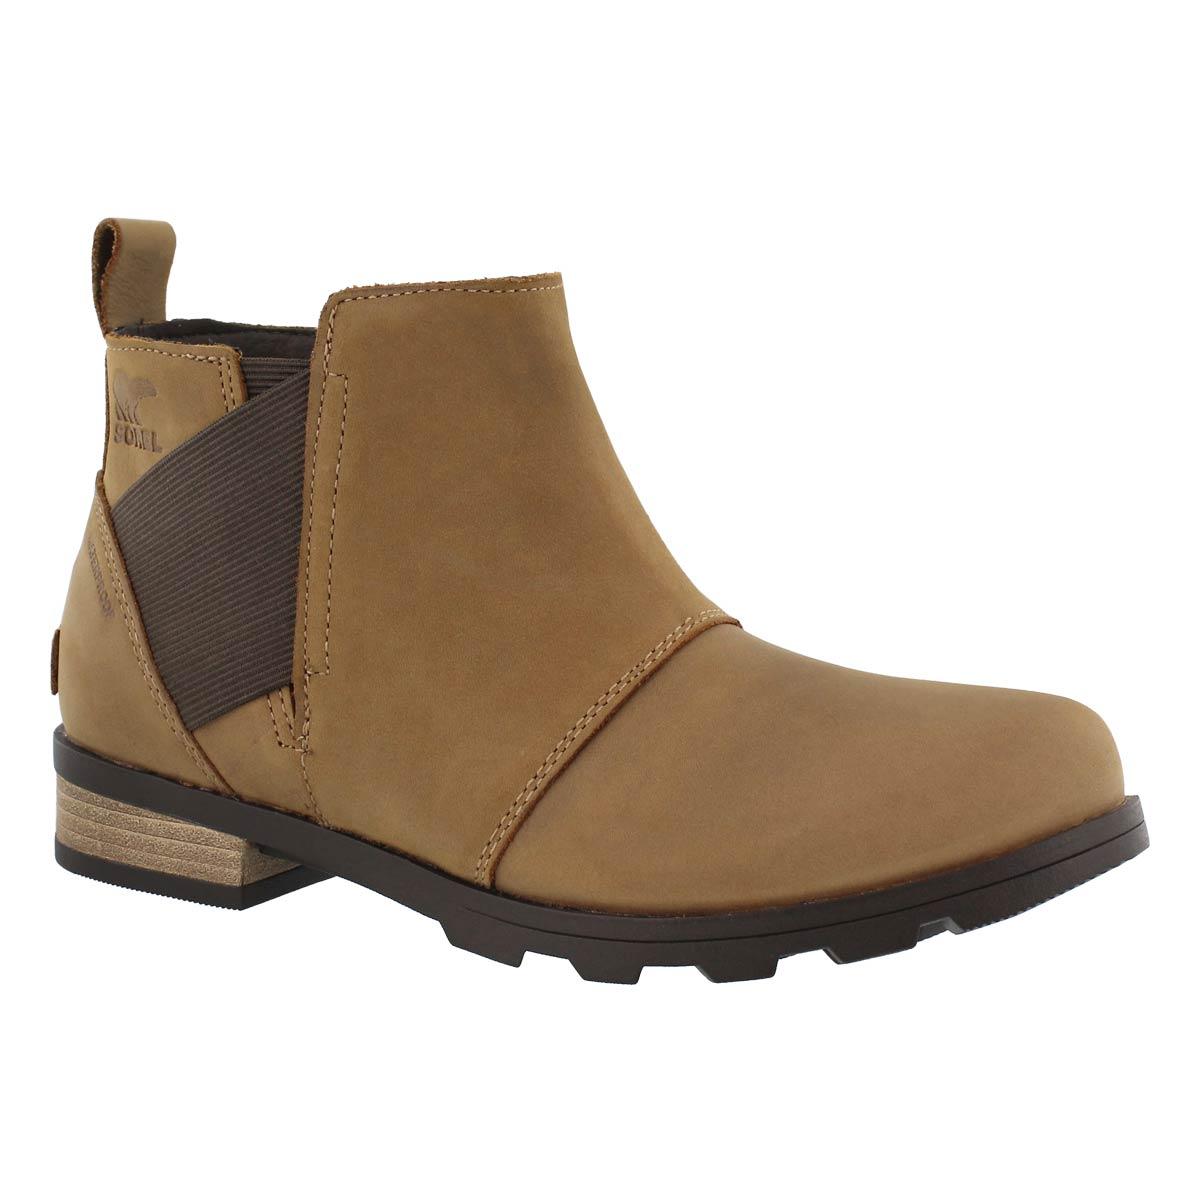 Women's EMELIE elk/crdvn waterproof chelsea boots